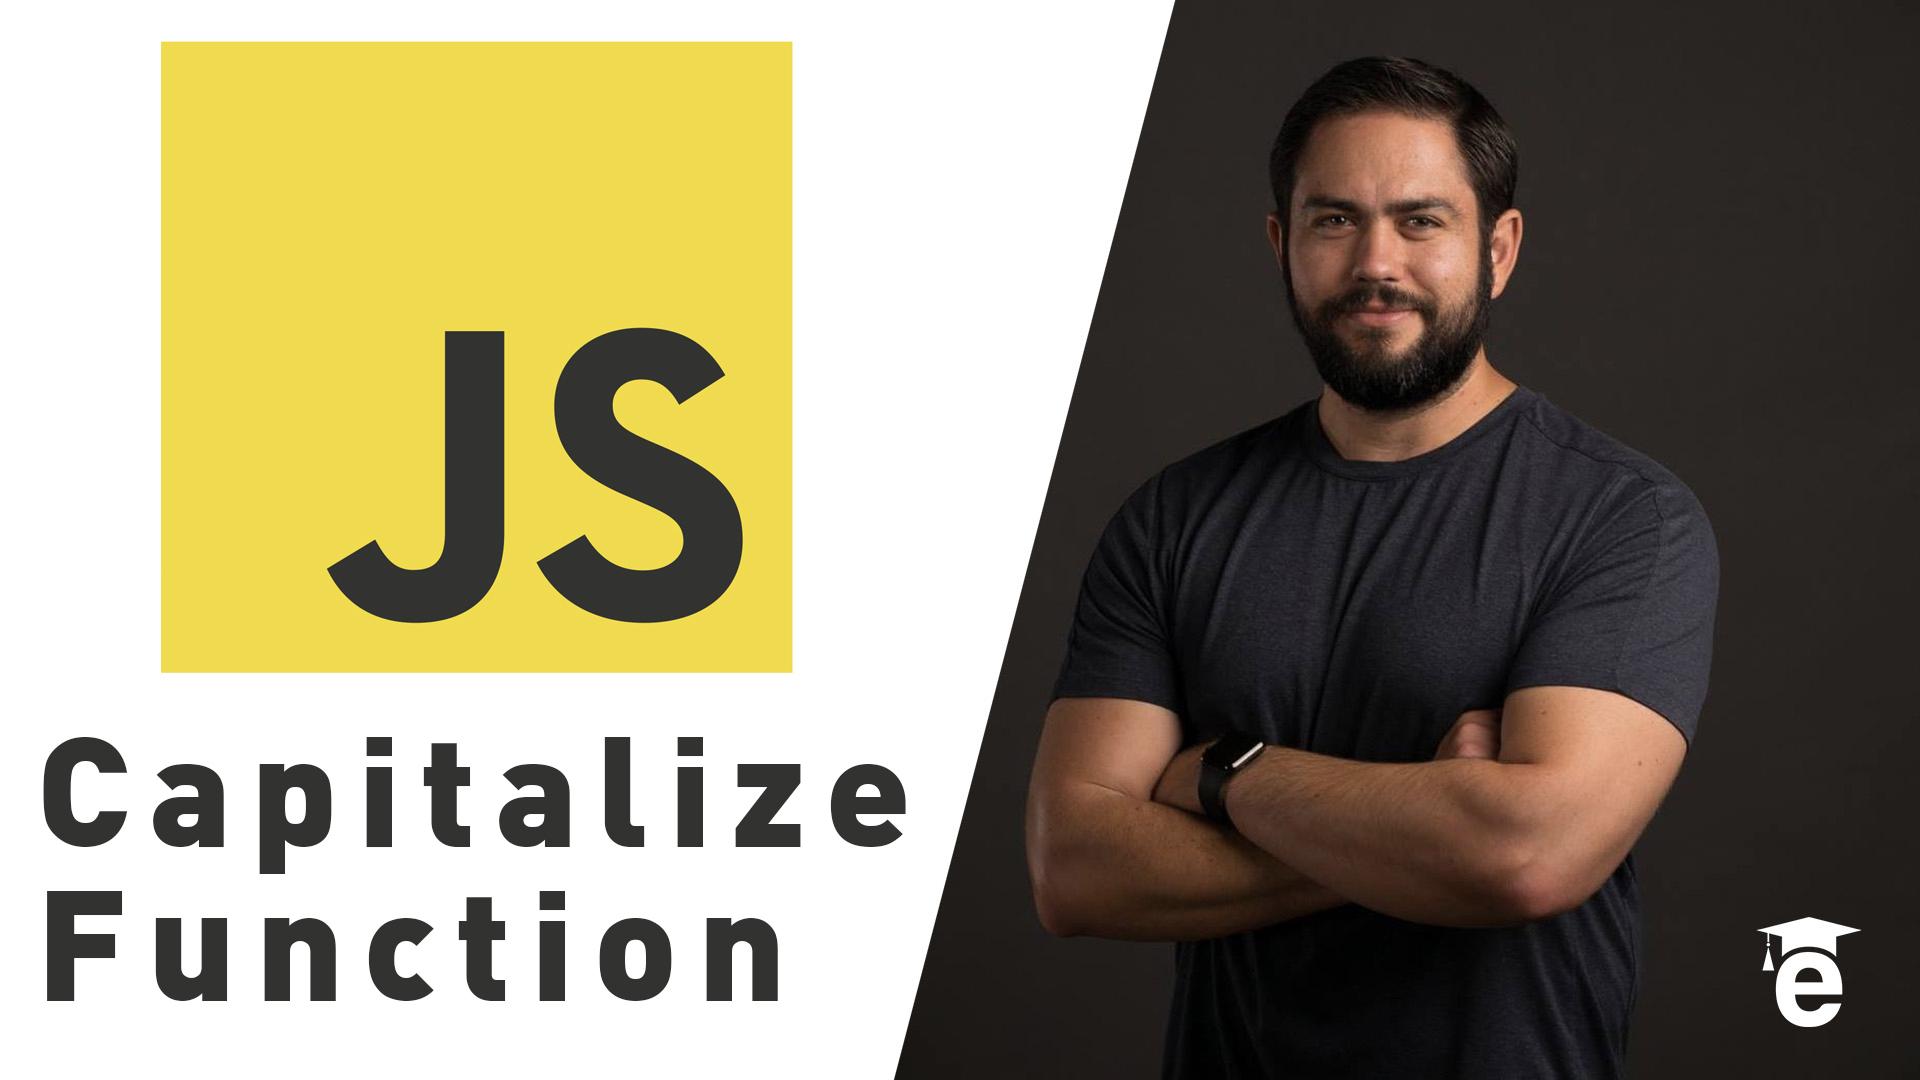 javascript capitalize function tutorial